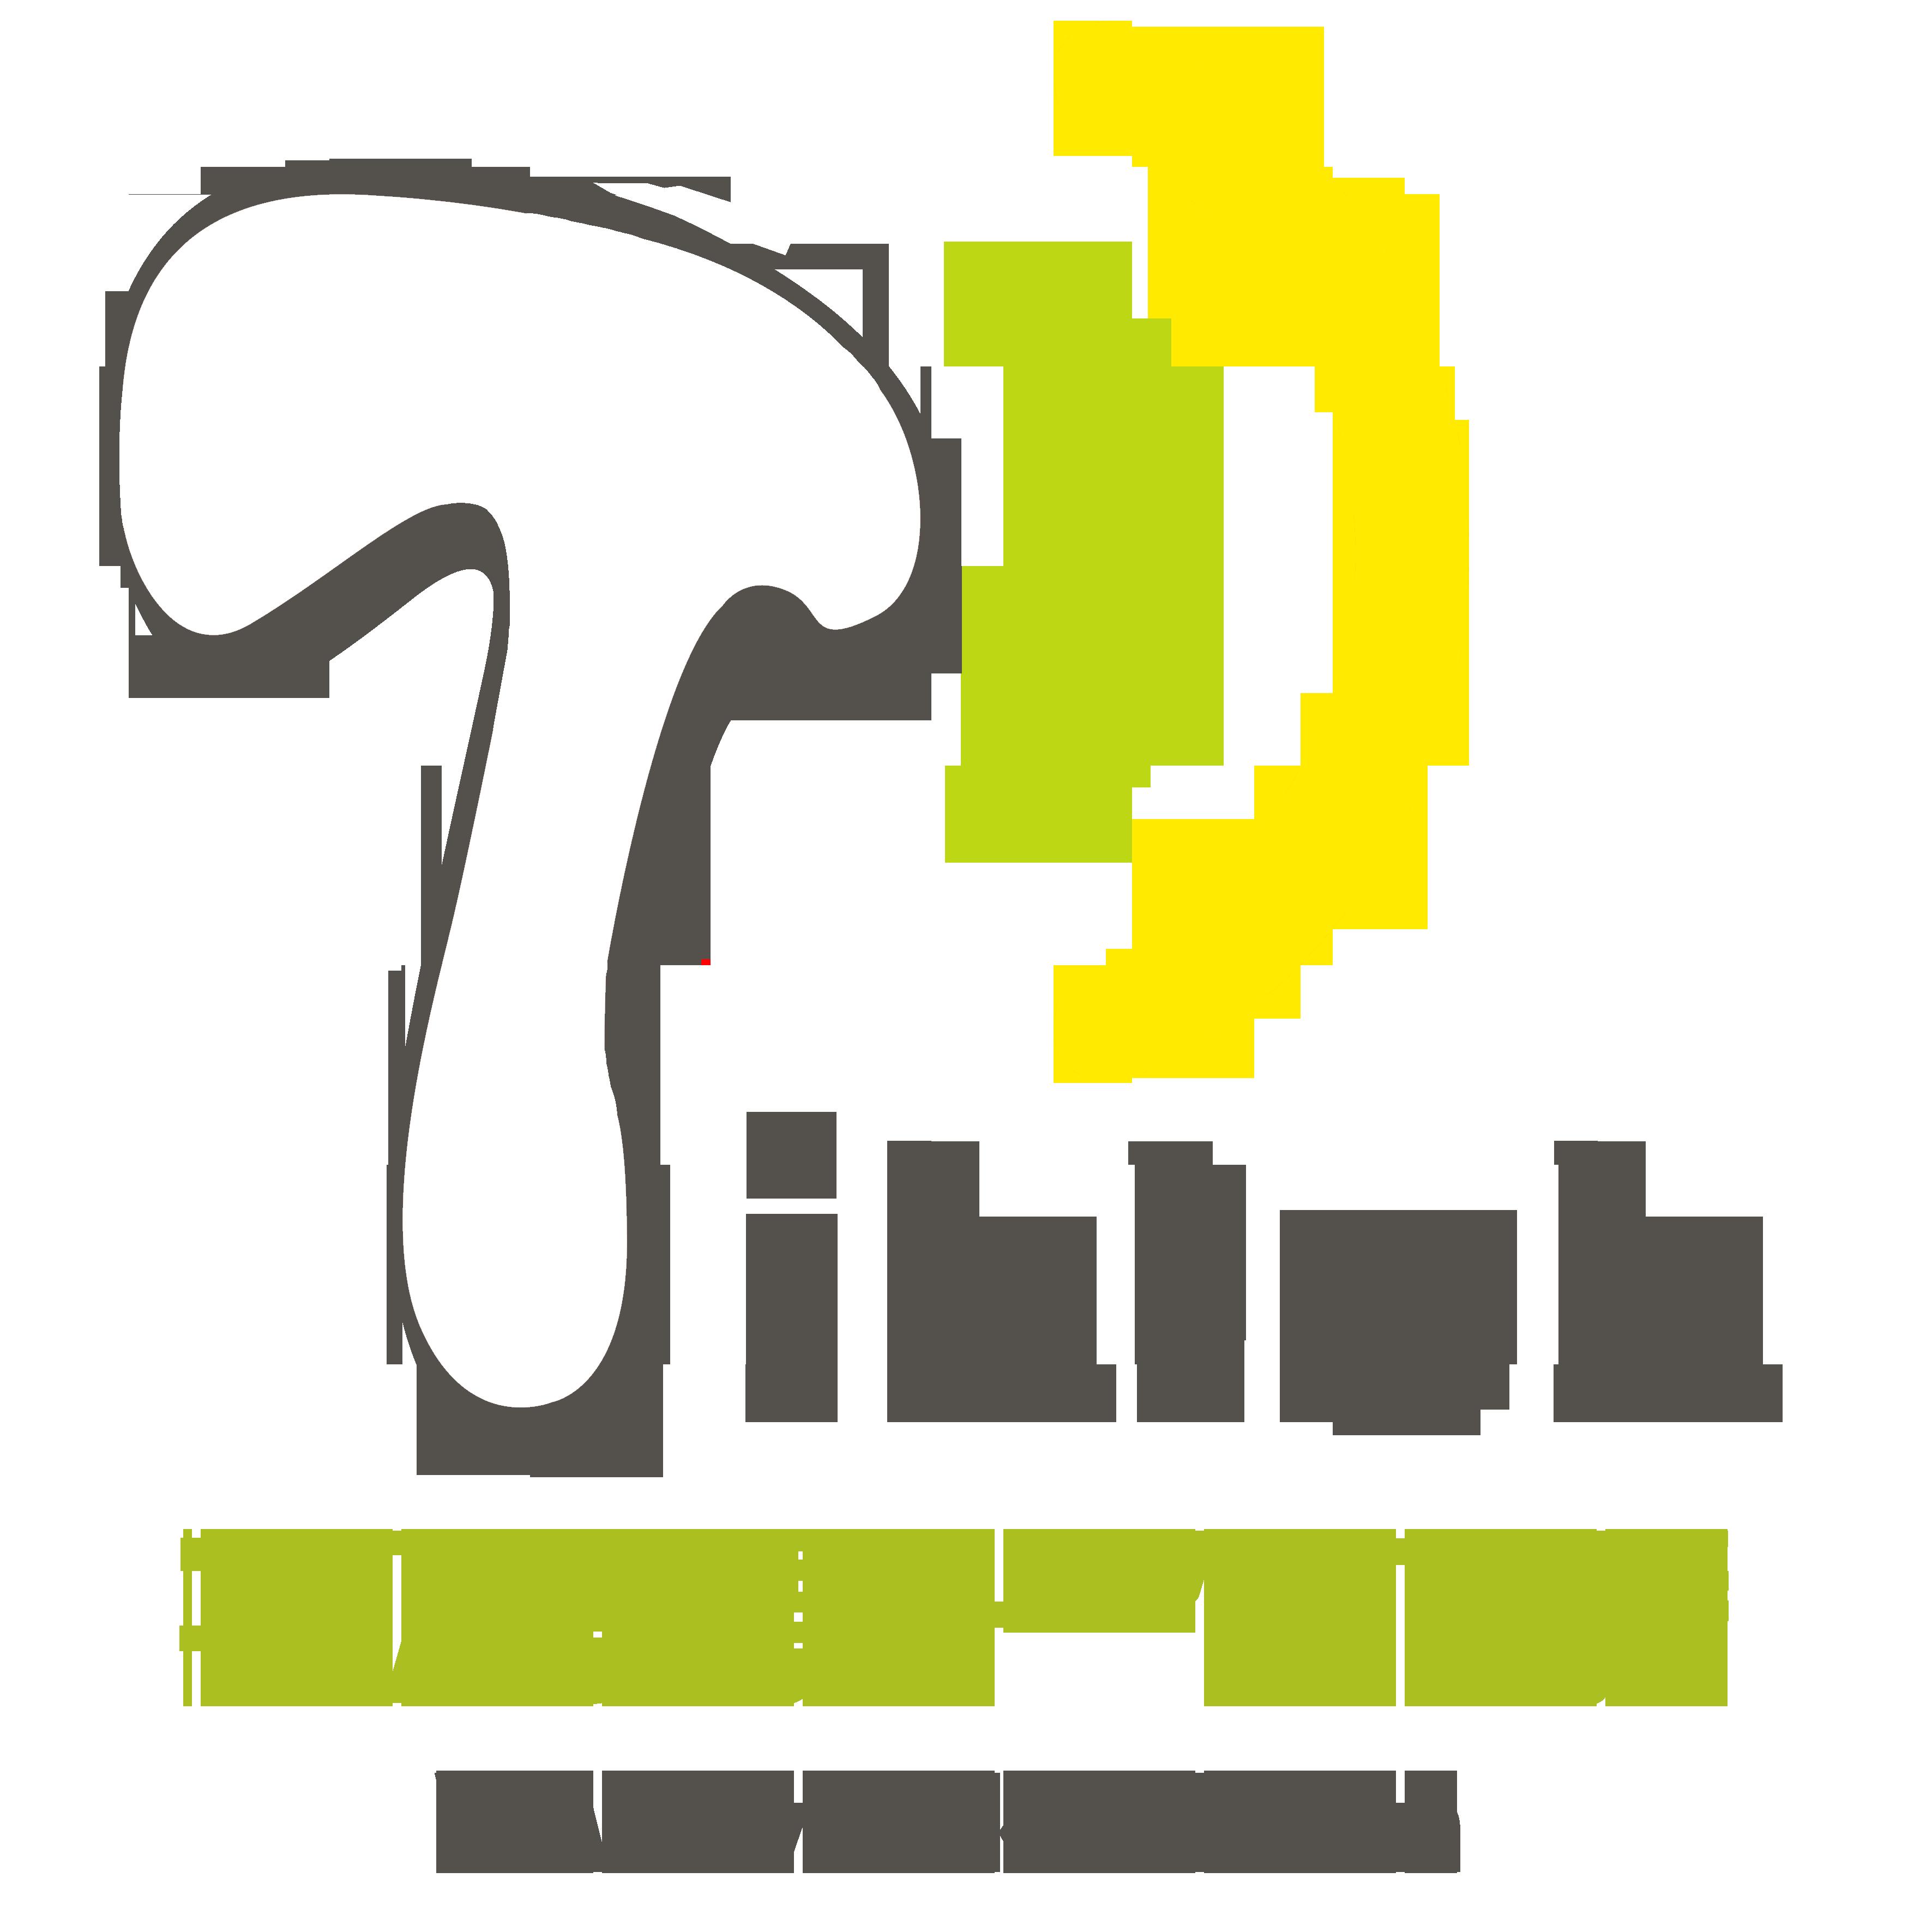 Tiktok 它不只是一个广播 www.titkok.cn